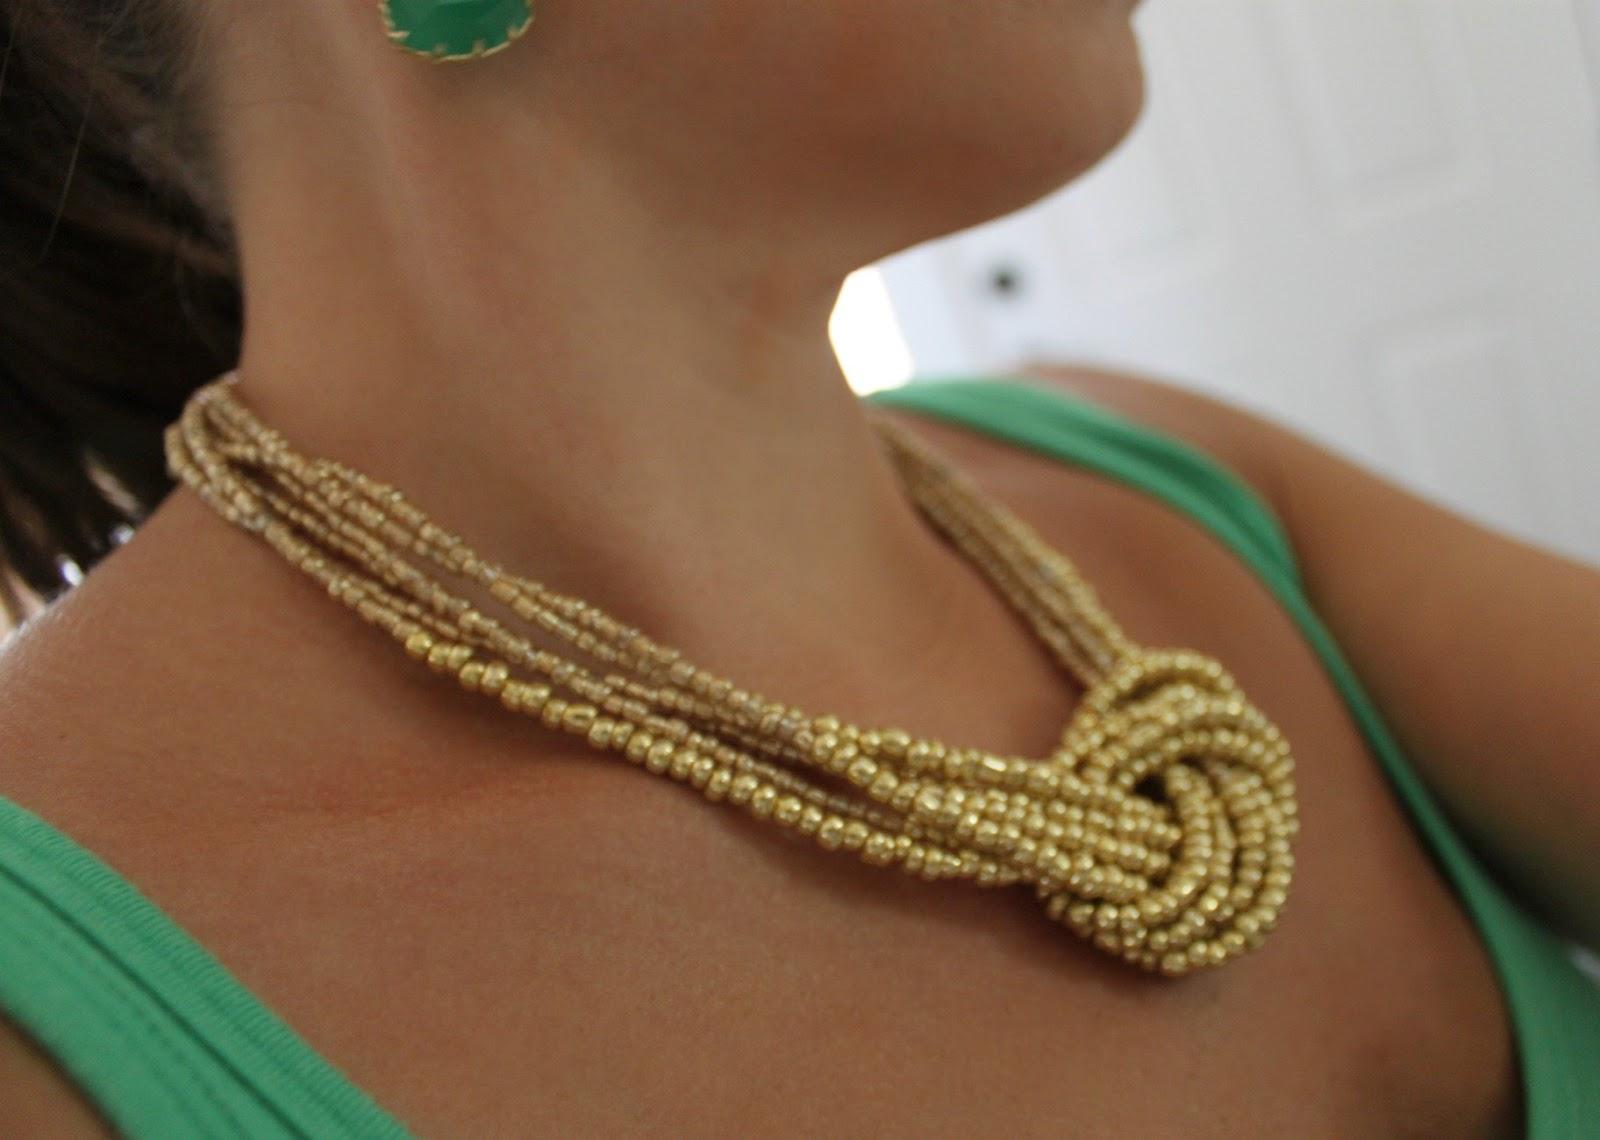 Statement Necklace Part I - Golden Knot Necklace